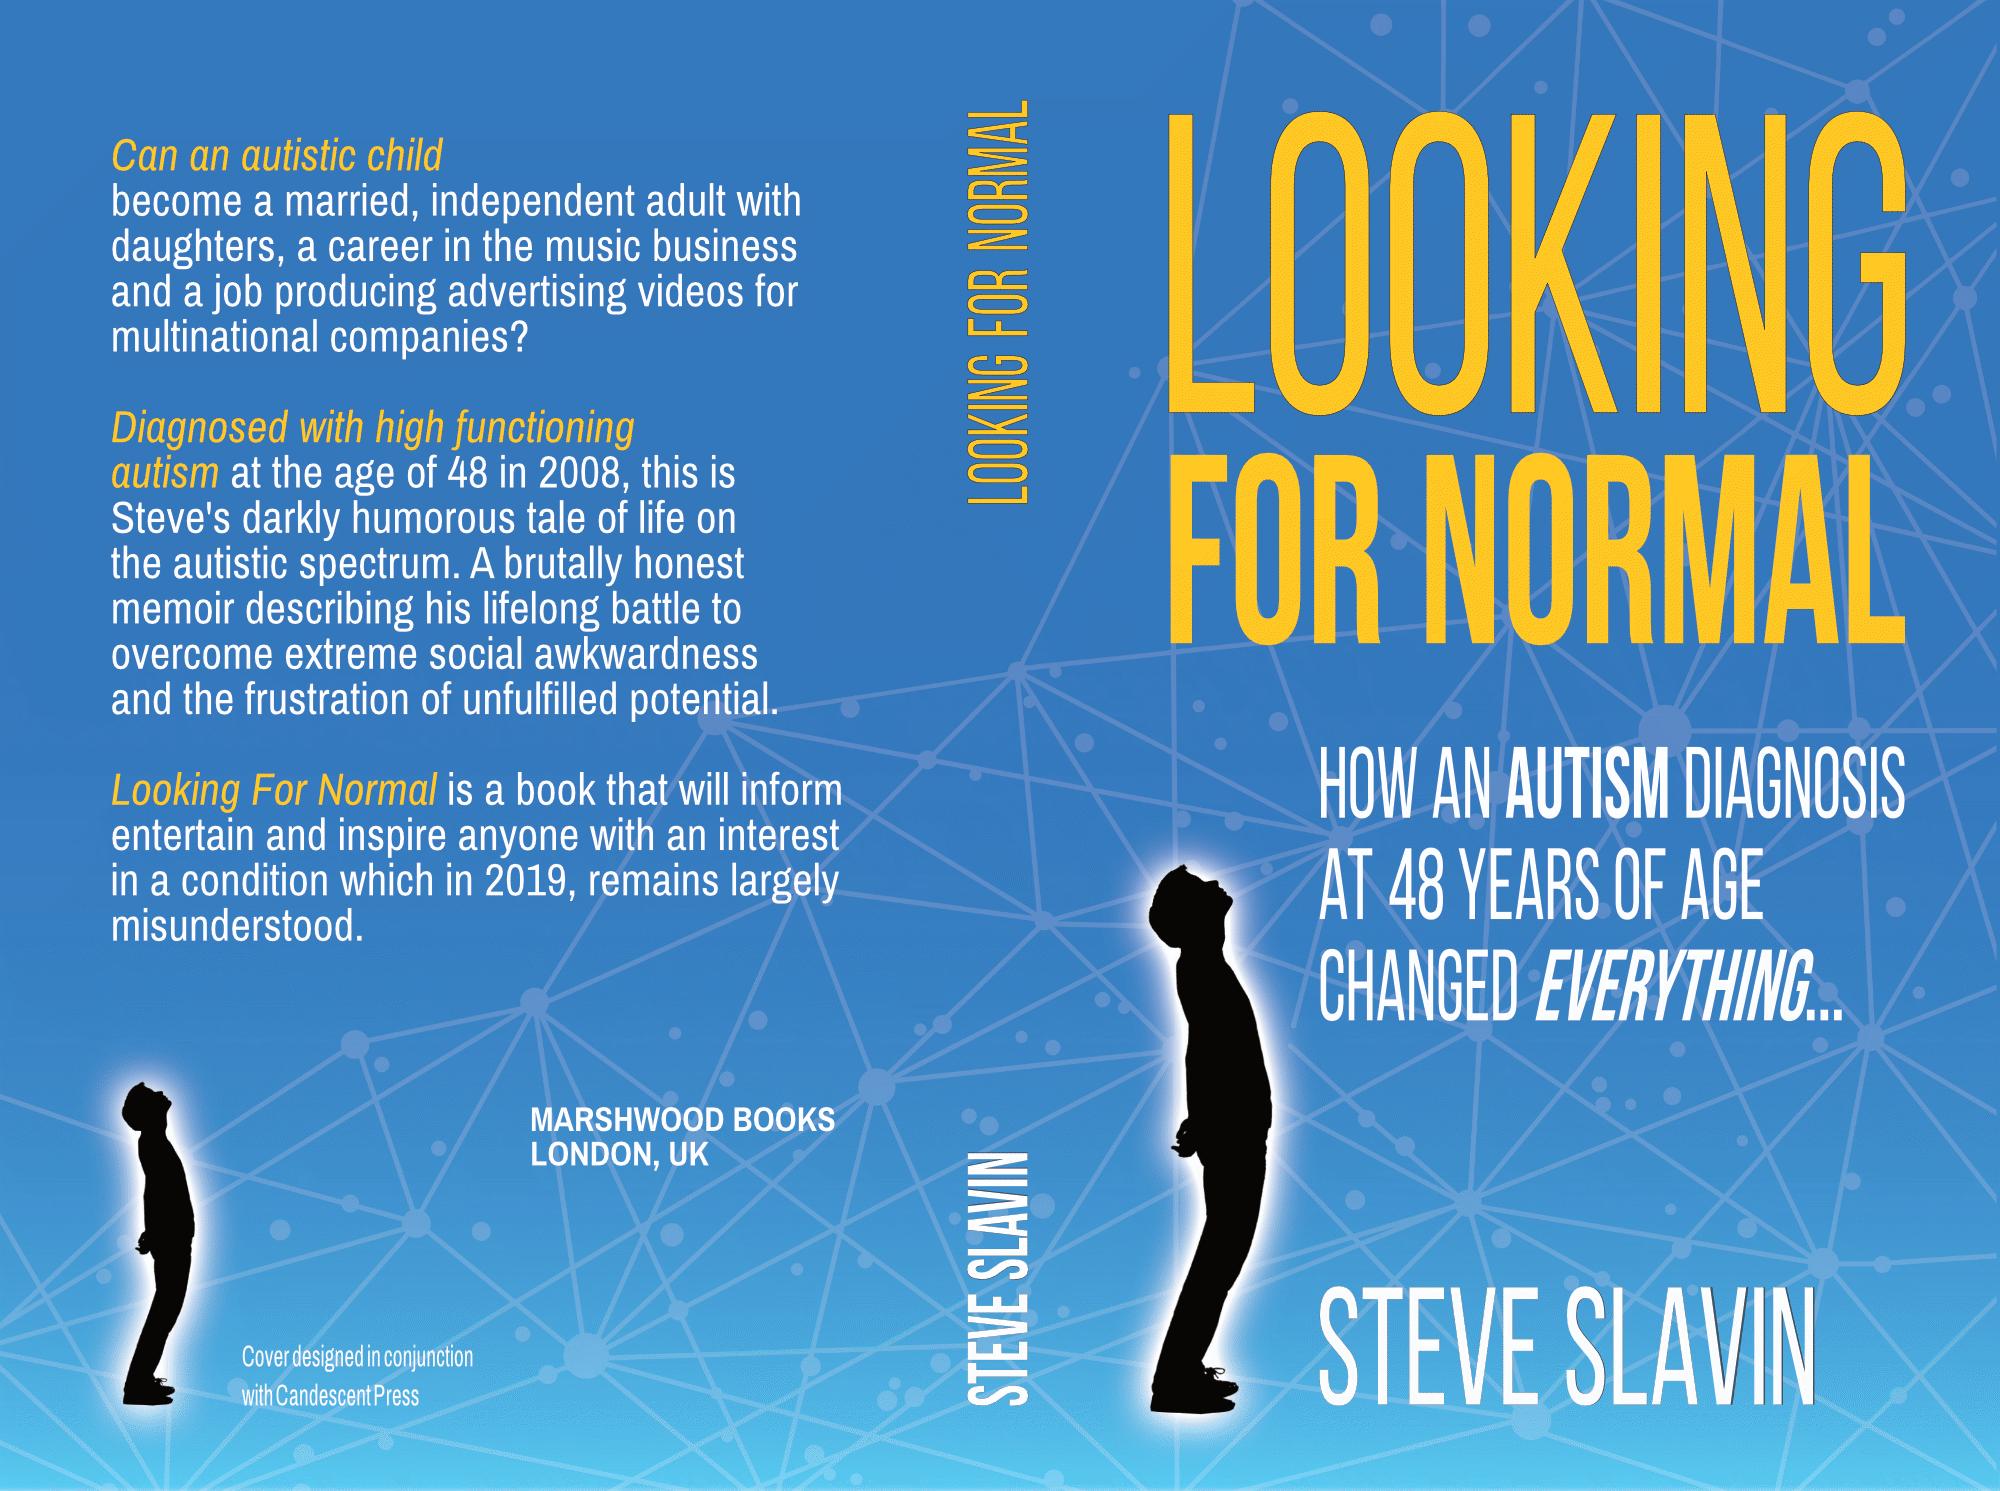 Looking for Normal Steve Slavin